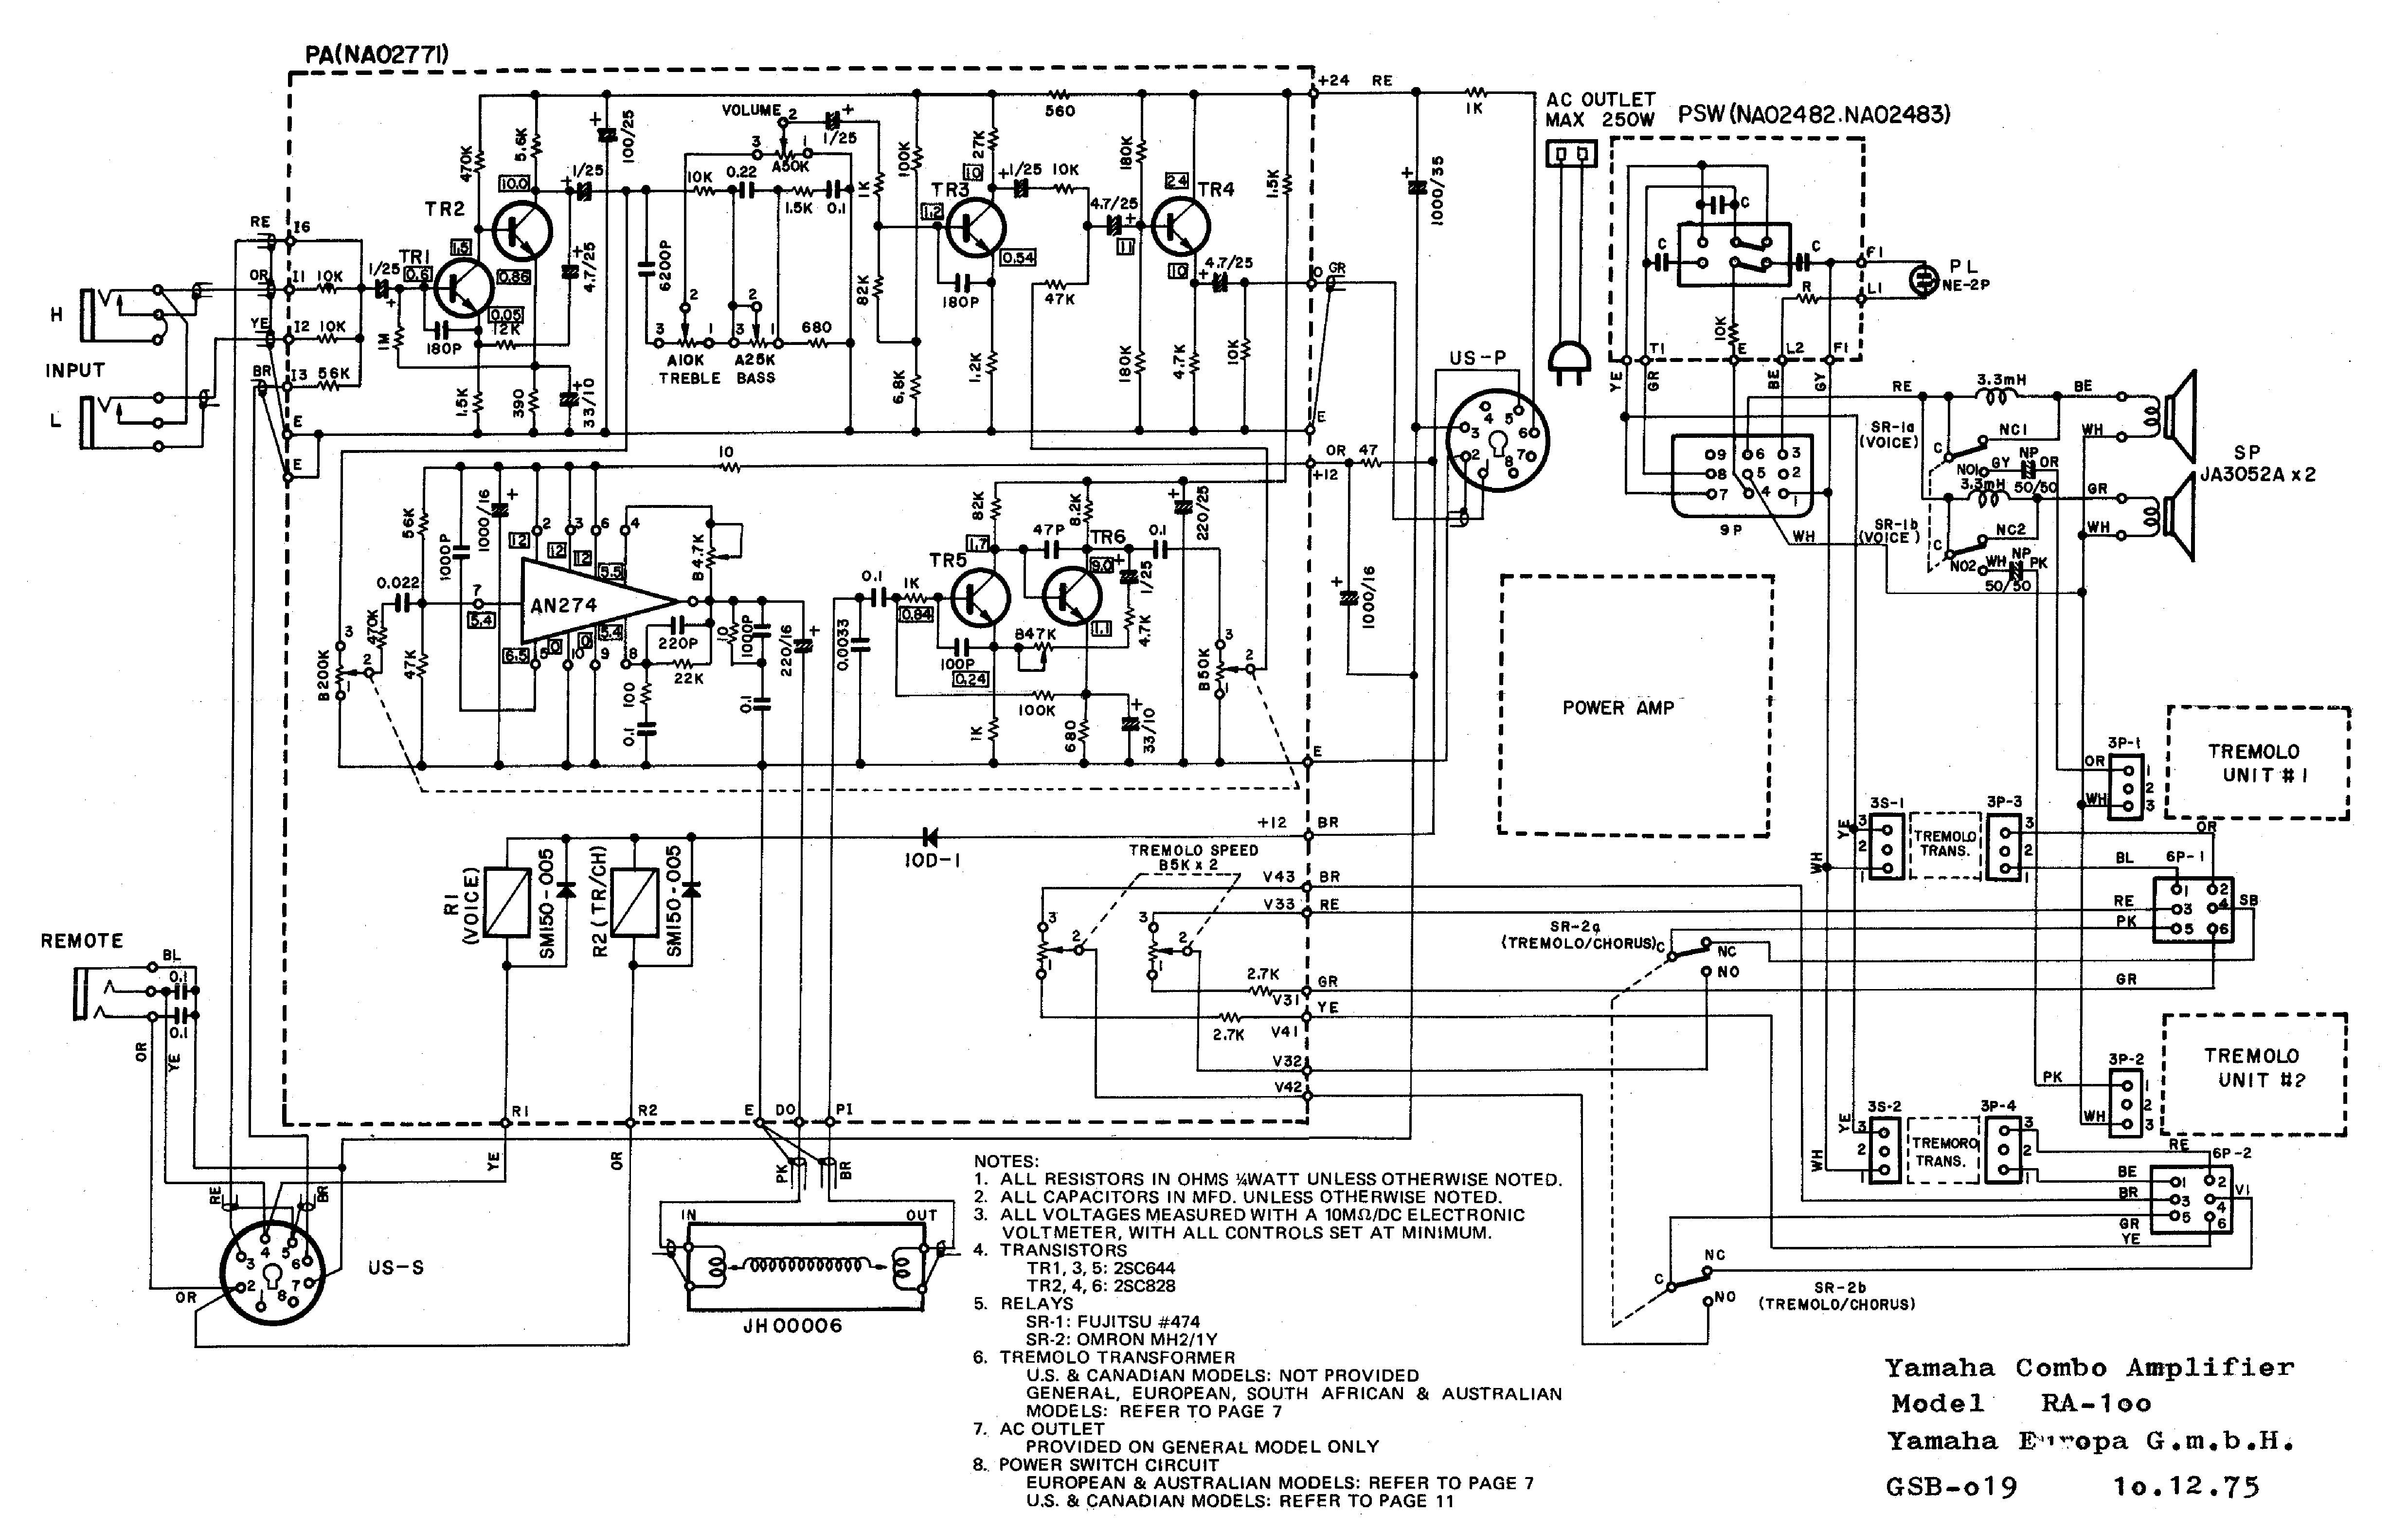 yamaha rx 100 wiring diagram pdf yamaha image yamaha stagepas 300 service manual schematics on yamaha rx 100 wiring diagram pdf